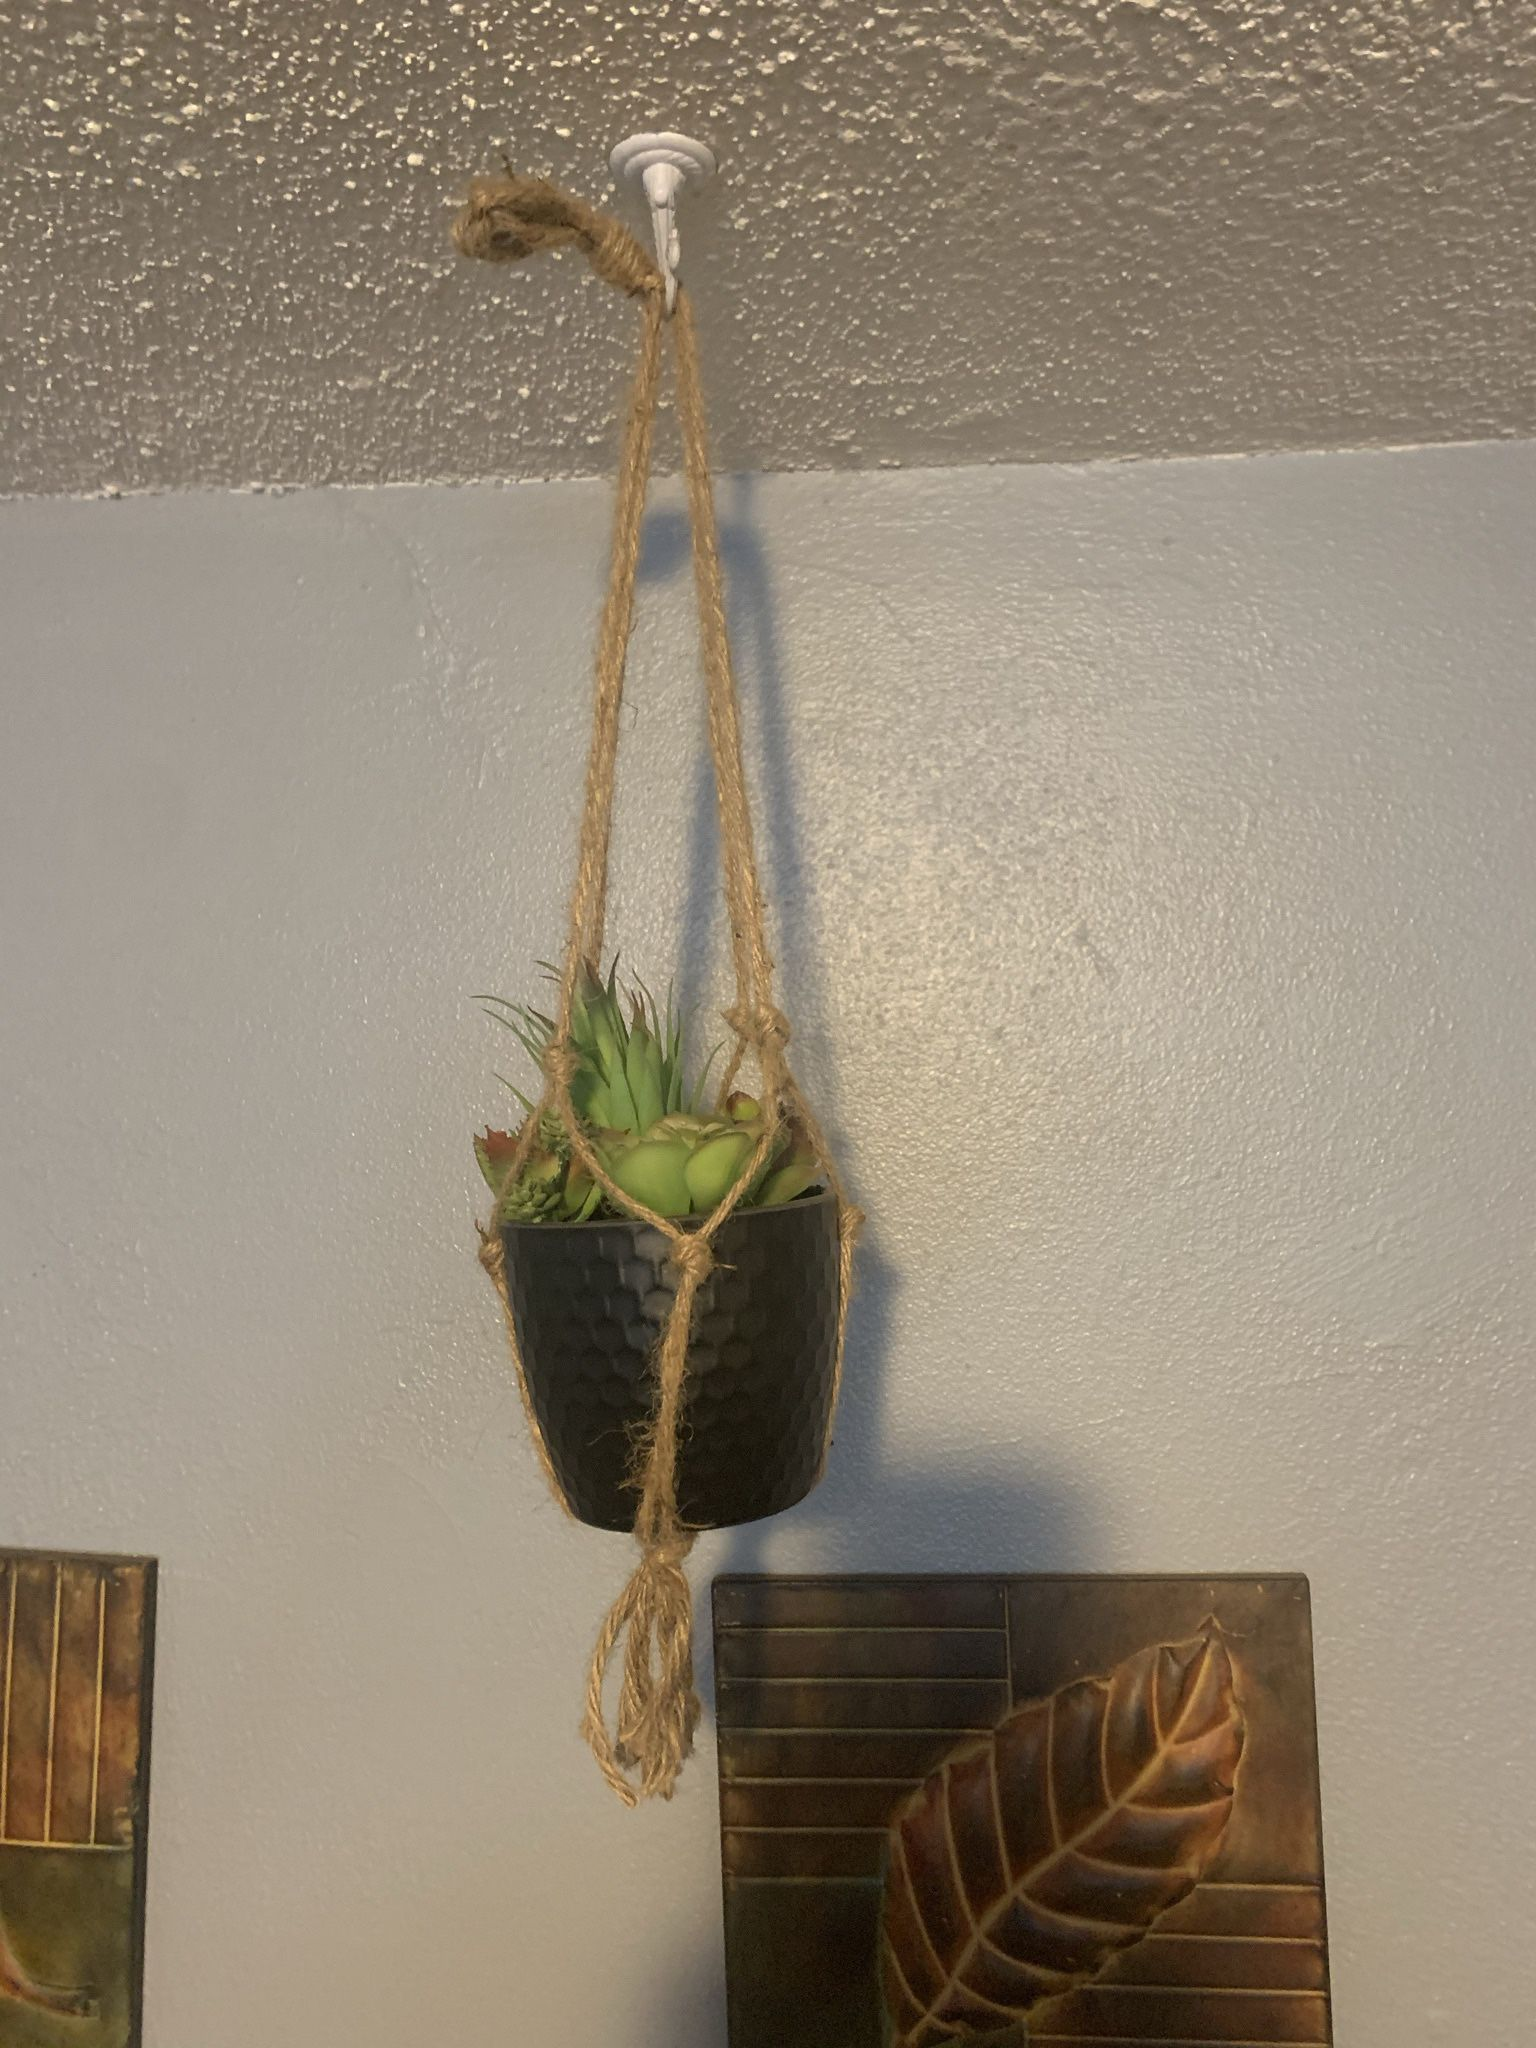 Decorative hanging Plants